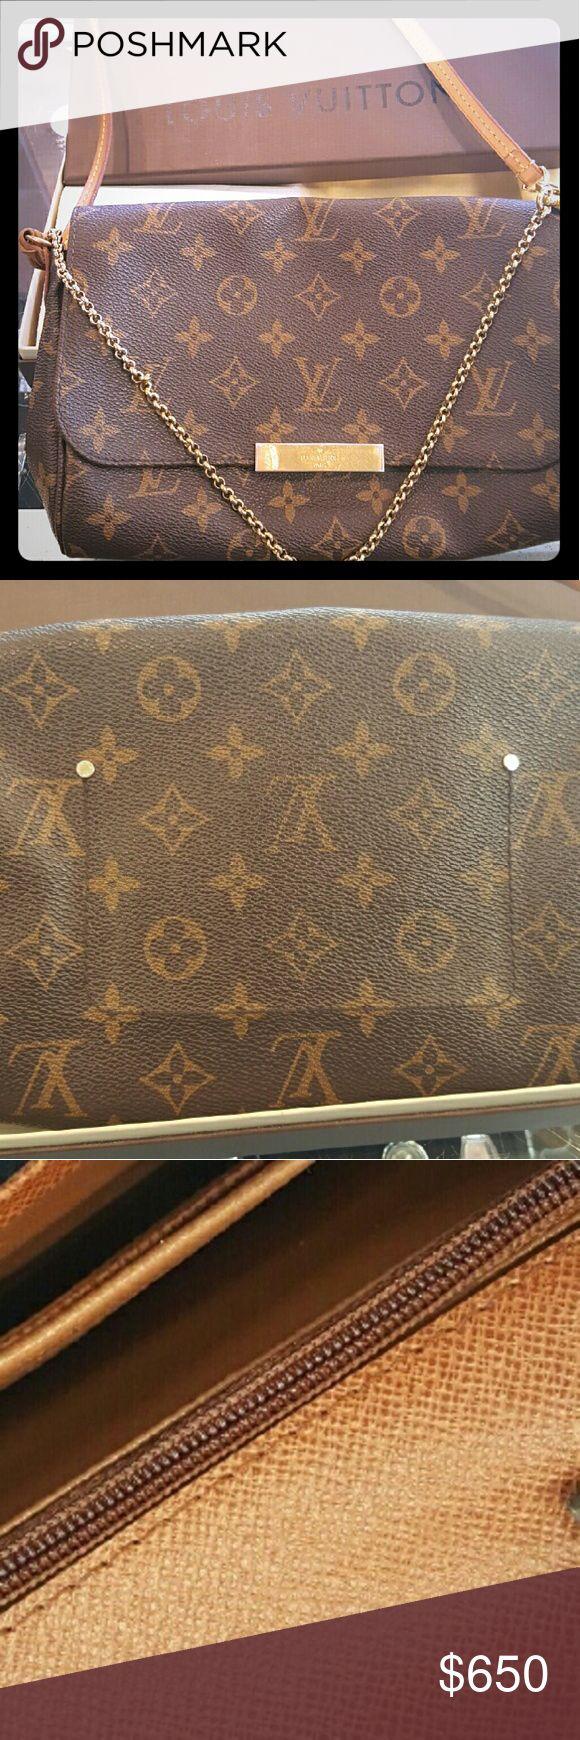 Louis Vuitton MM cross body bag Louis Vuitton MM cross body bag Louis Vuitton Bags Crossbody Bags